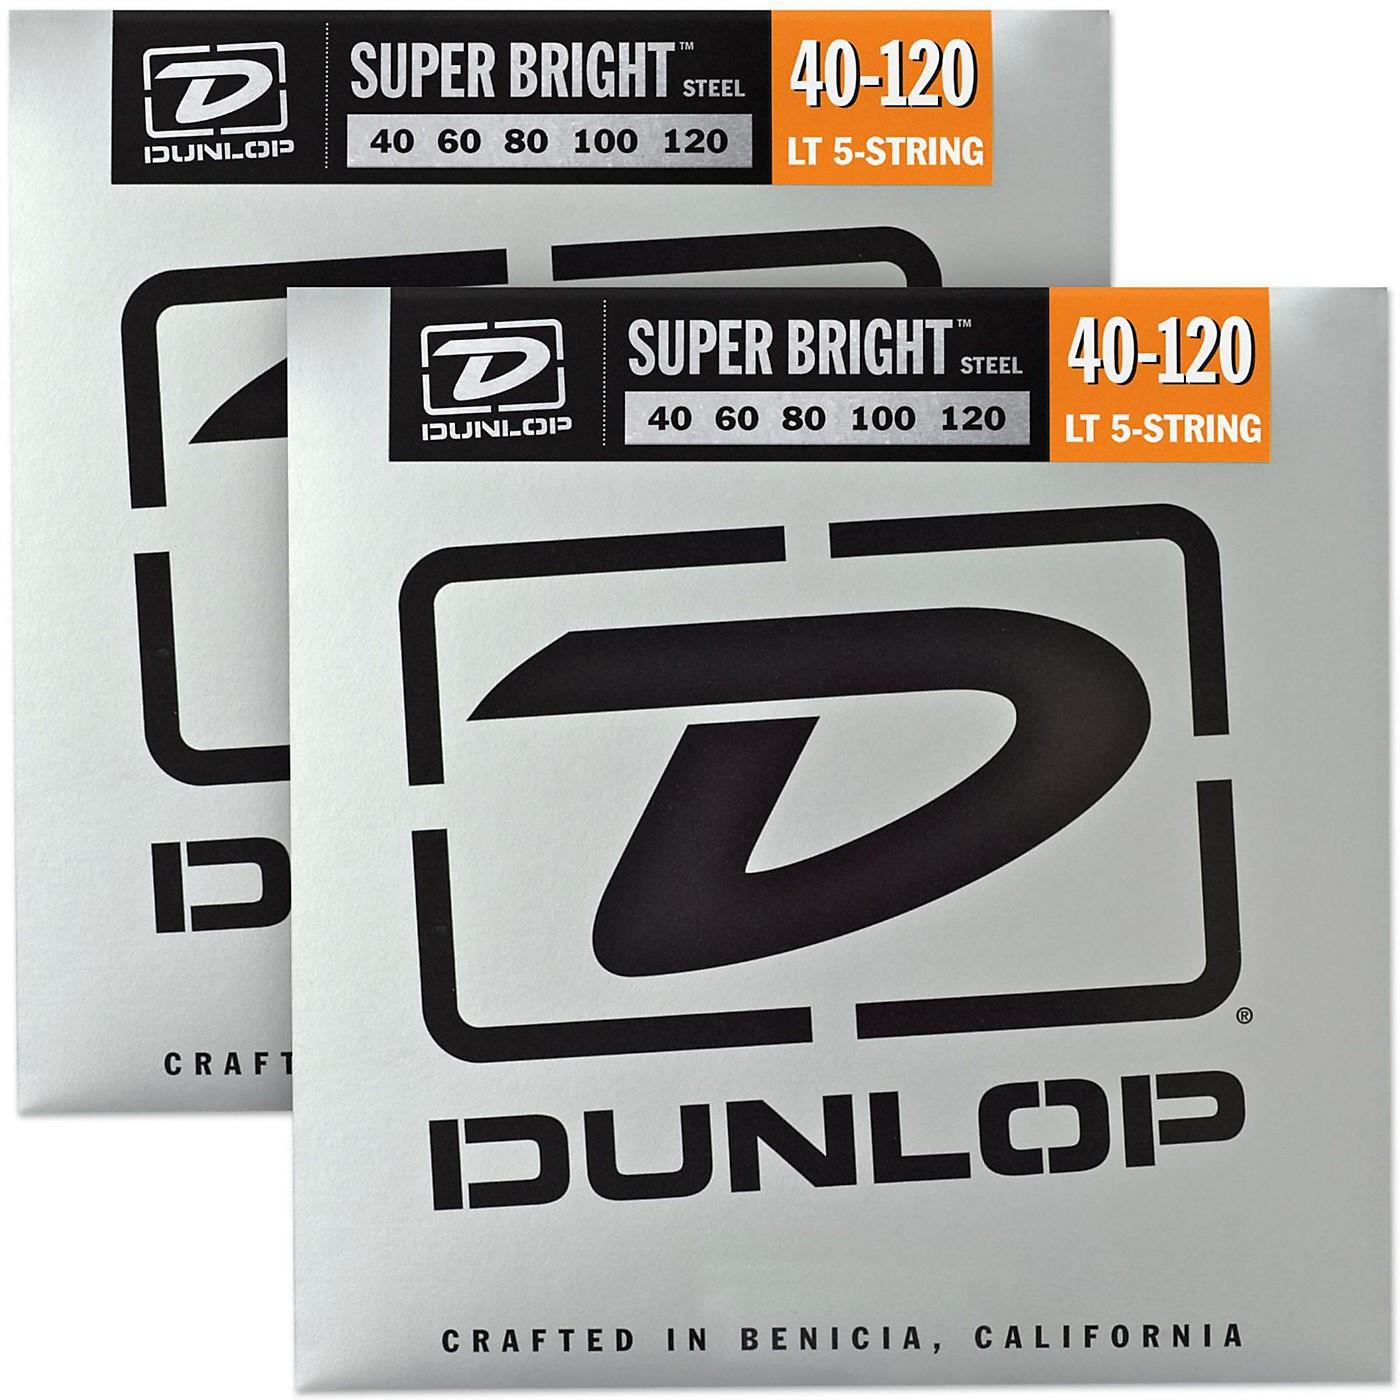 Dunlop Super Bright Steel Light 5-String Bass Guitar Strings (40-120) 2-Pack thumbnail